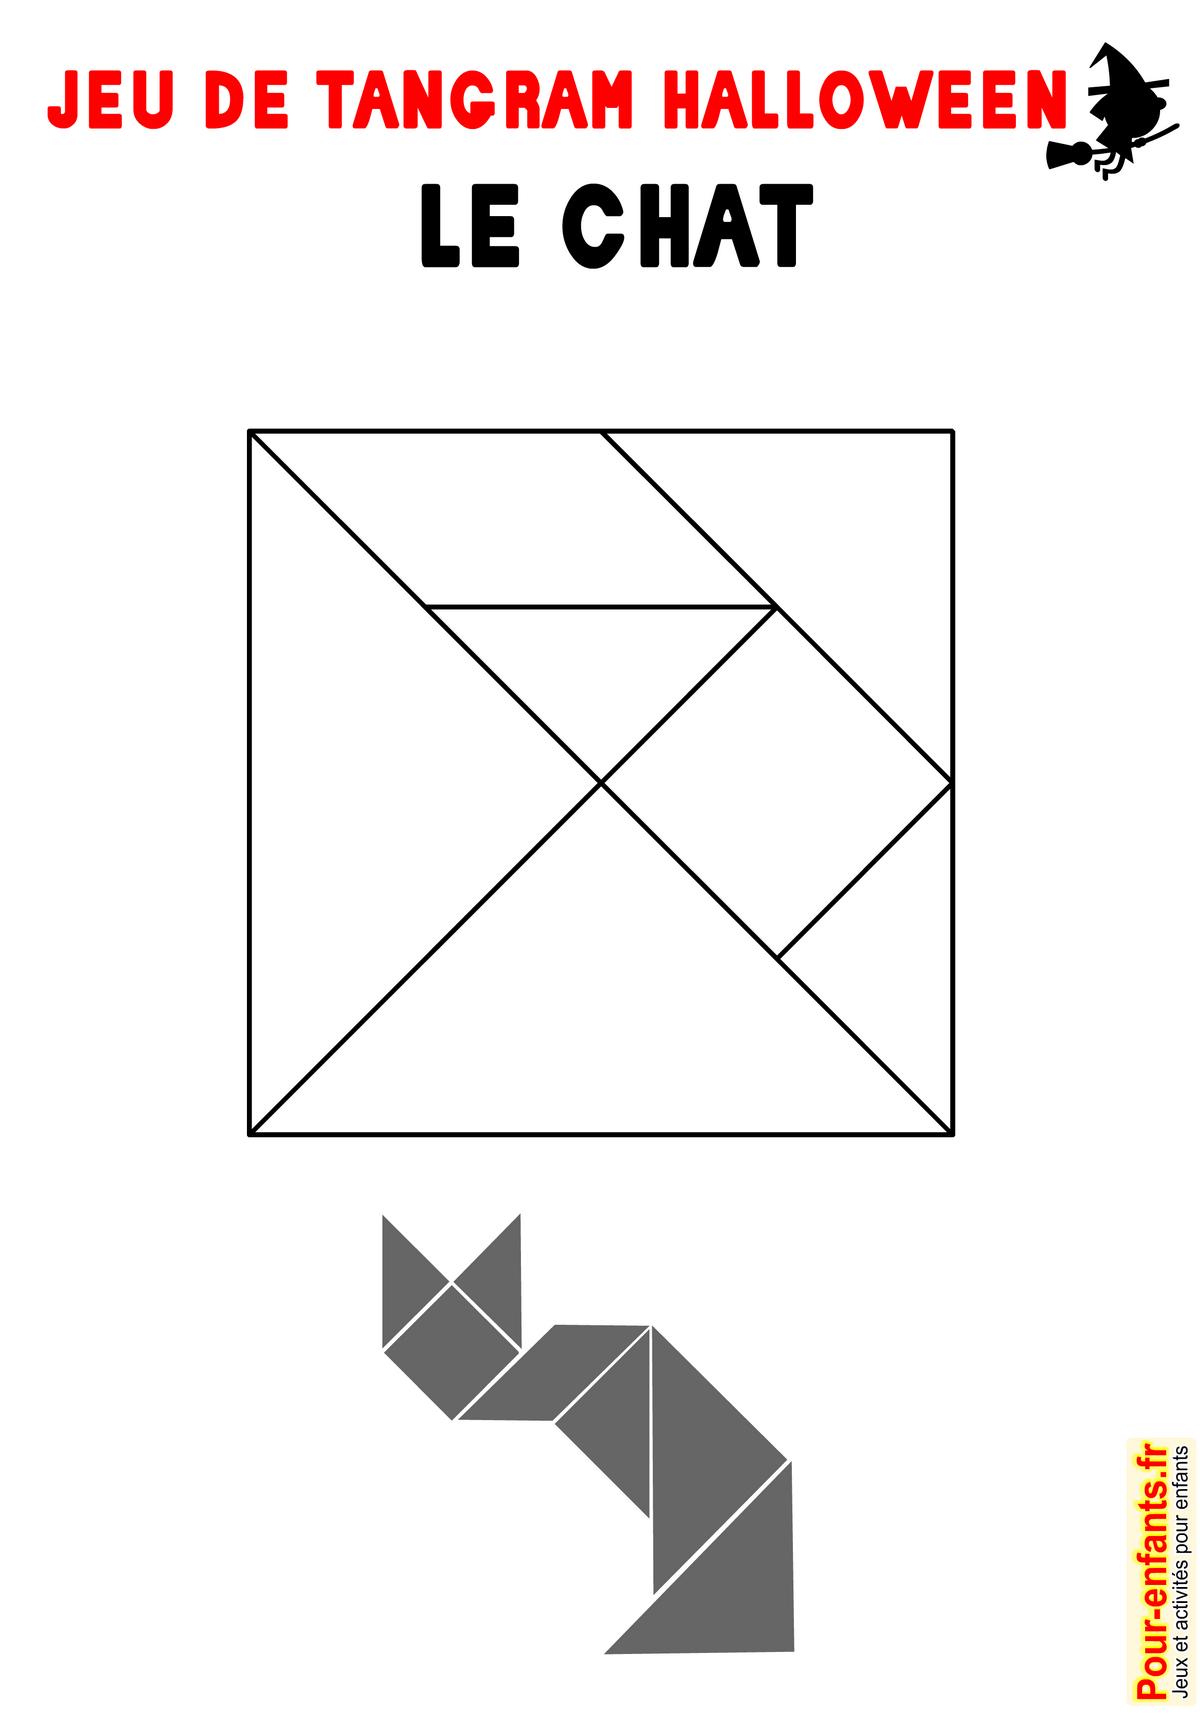 Jeu De Tangram À Imprimer Chat Halloween Imprimable Gratuit pour Jeu De Tangram À Imprimer